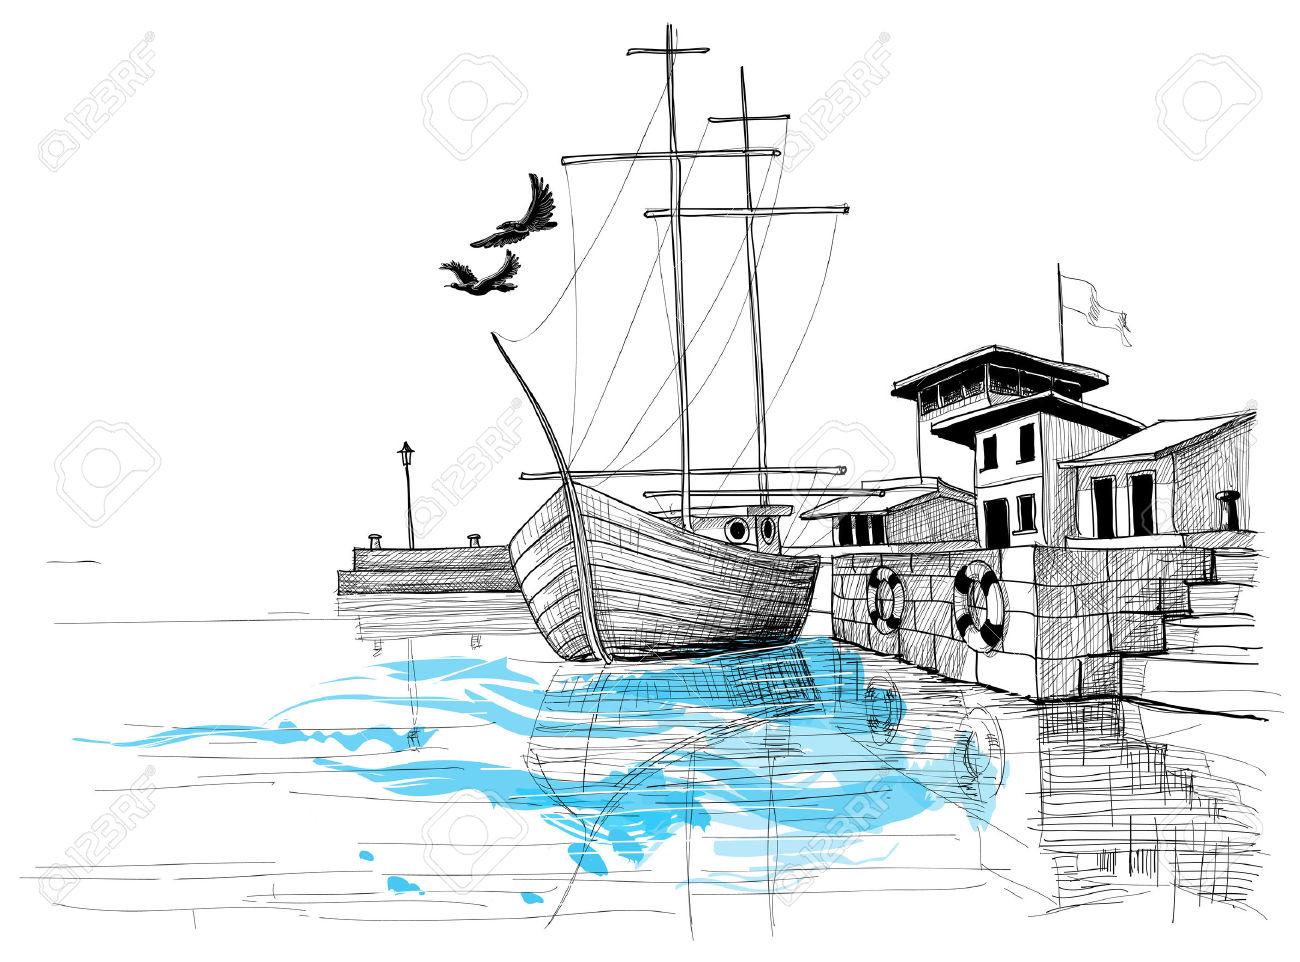 Ship harbor clipart #1